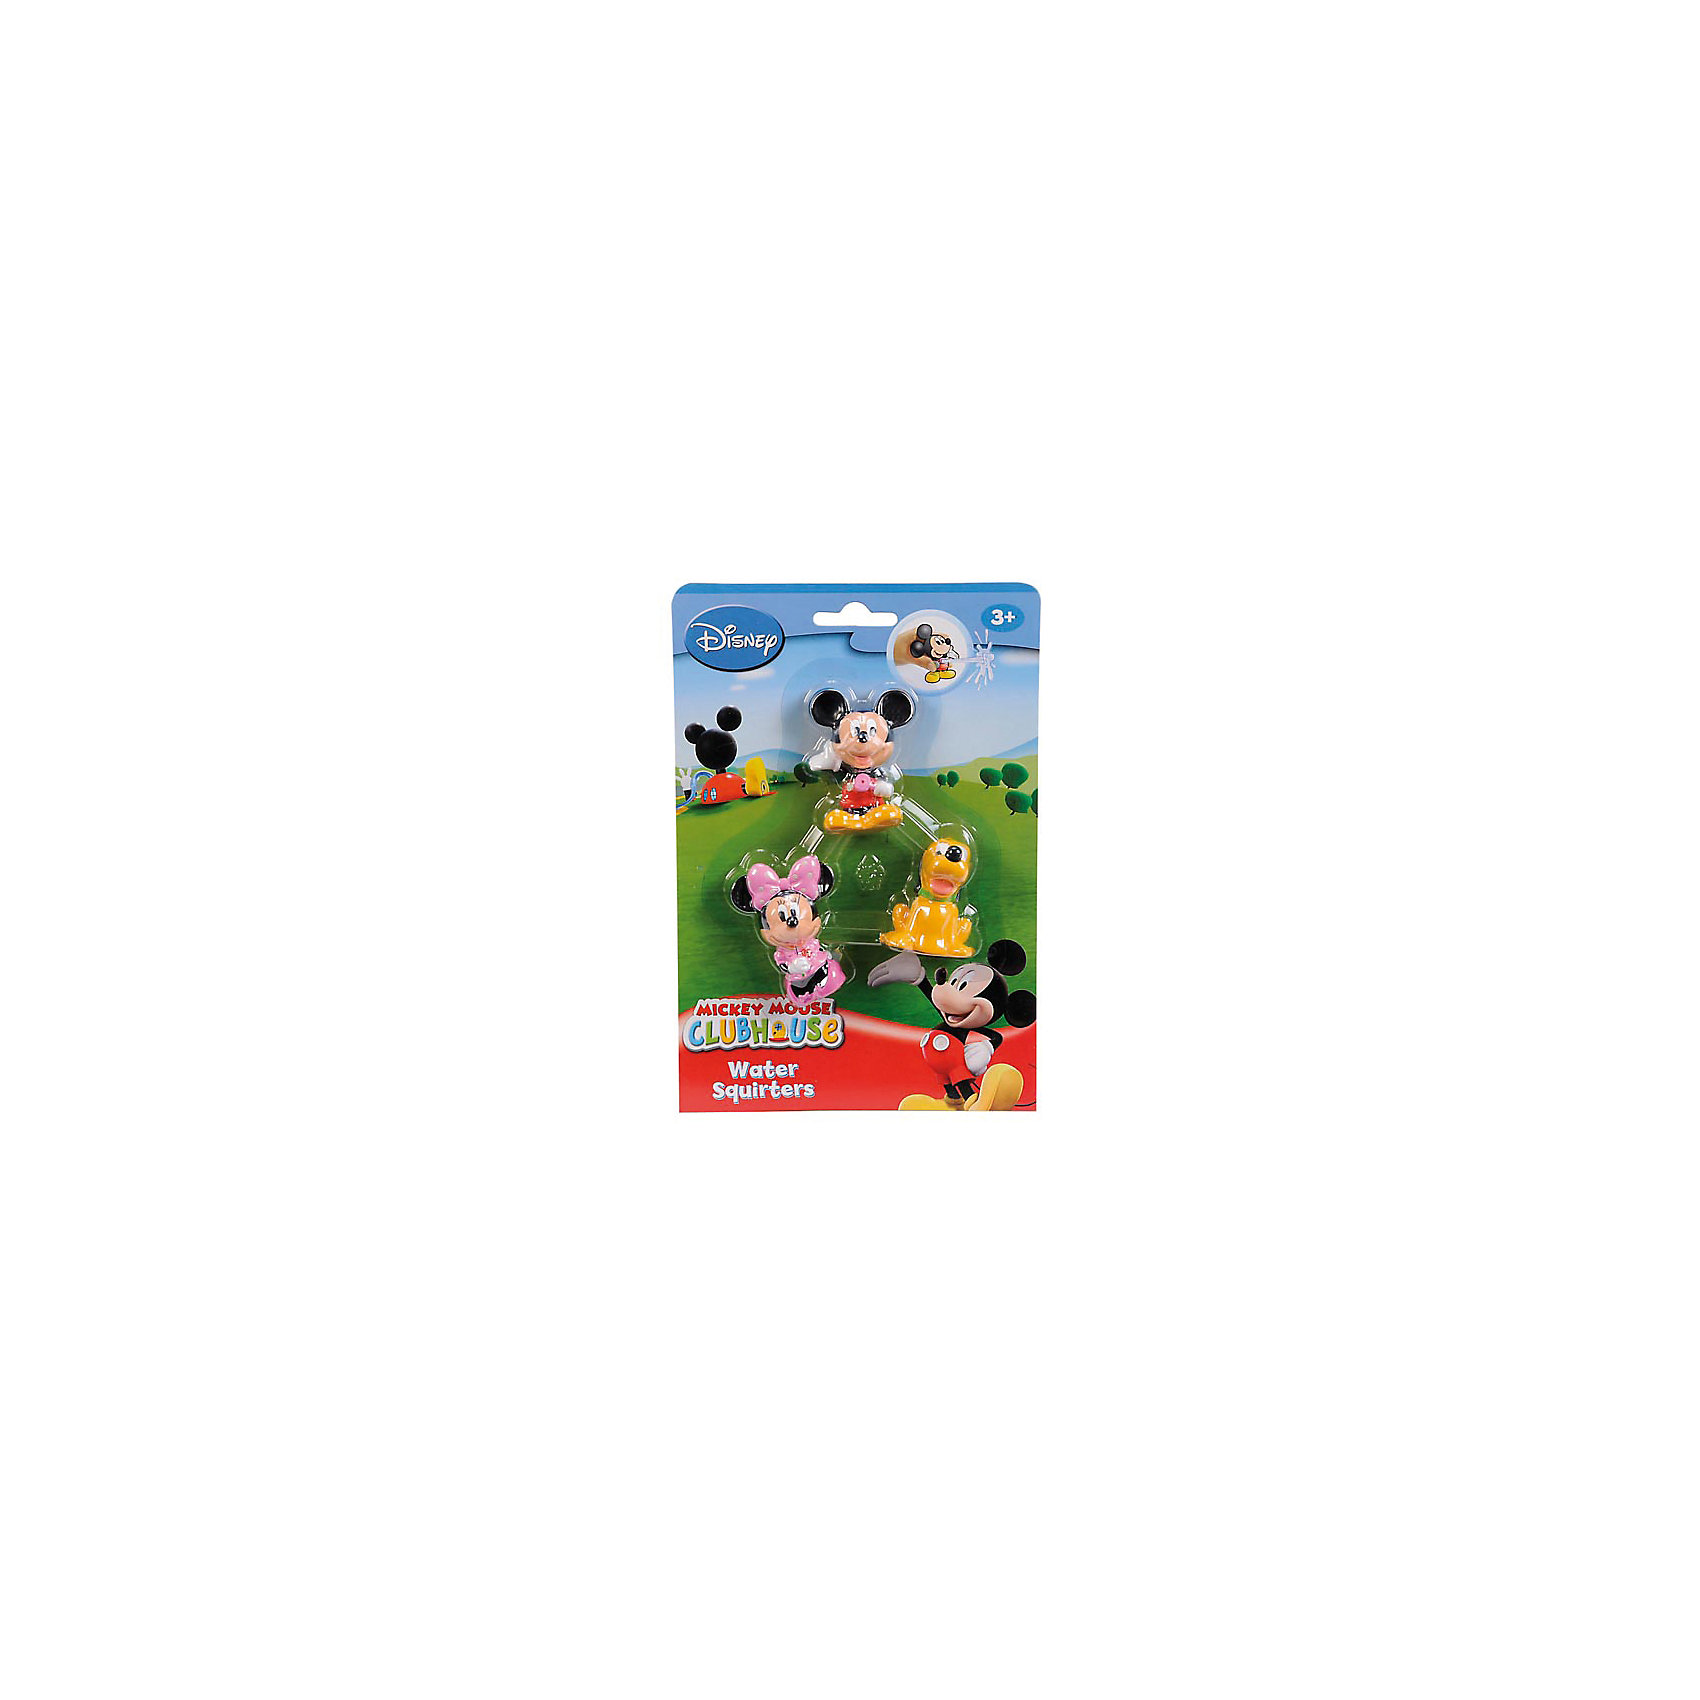 Simba Брызгалки Микки Маус, 3 фигурки, Simba фигурки игрушки prostotoys пупсень серия лунтик и его друзья